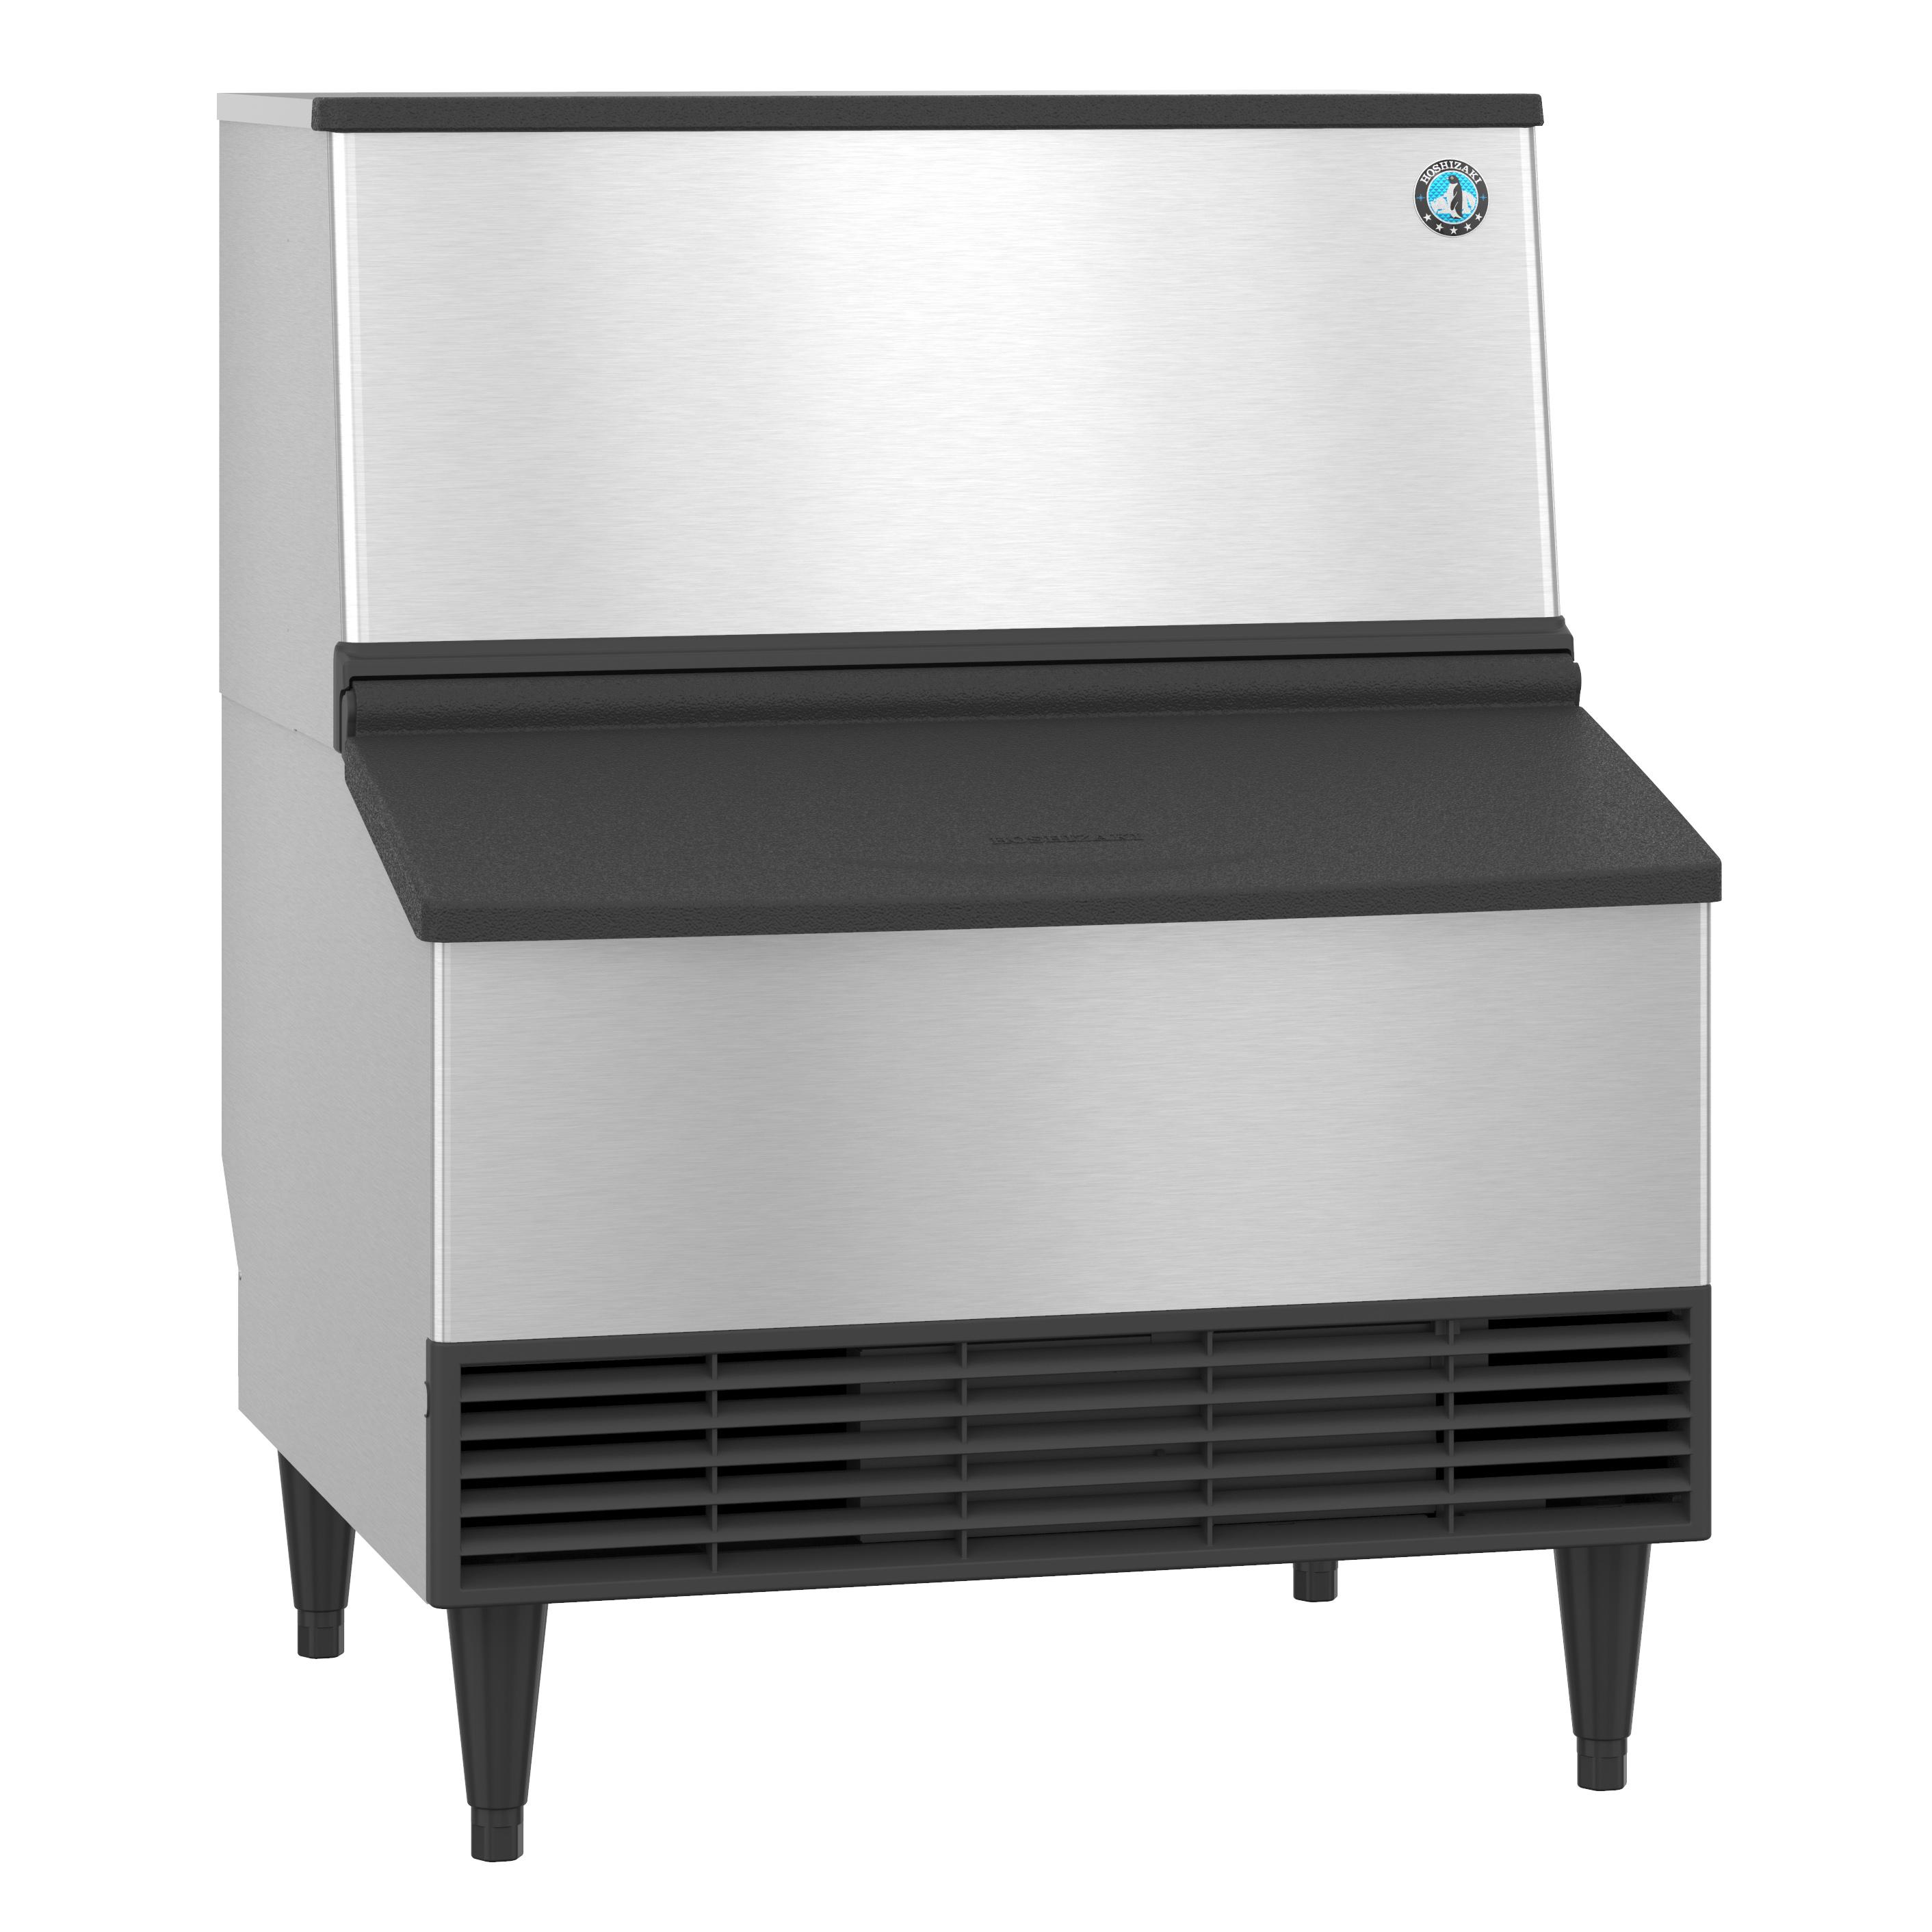 Hoshizaki KM-301BWJ ice cubers, ice storage & ice dispensers